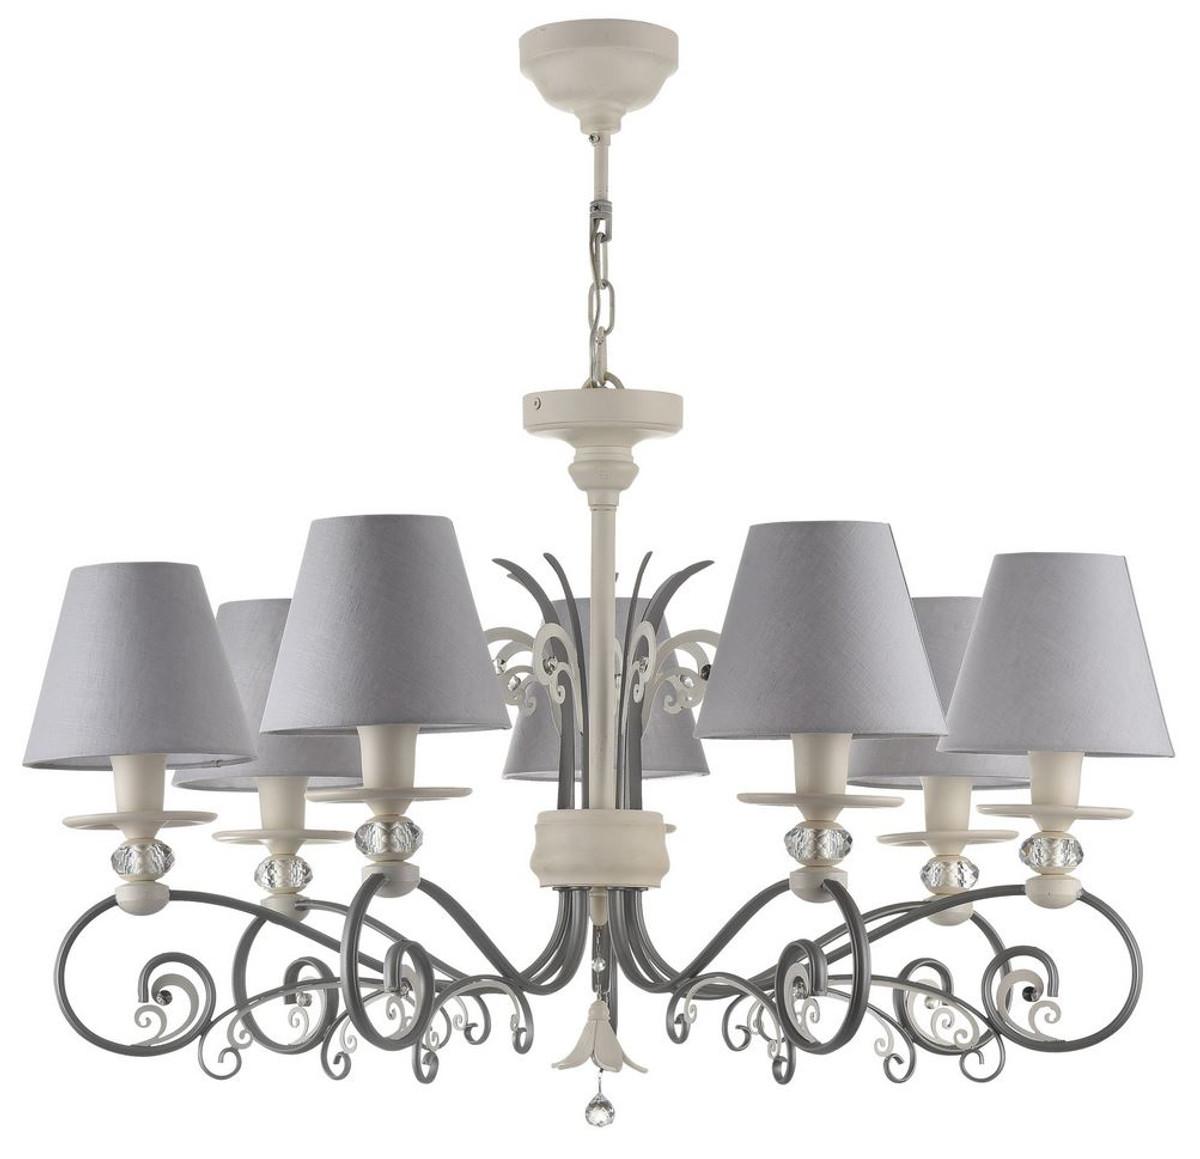 Casa padrino baroque chandelier white gray 75 x h 46 cm casa padrino baroque chandelier white gray 75 x h 46 cm baroque aloadofball Images